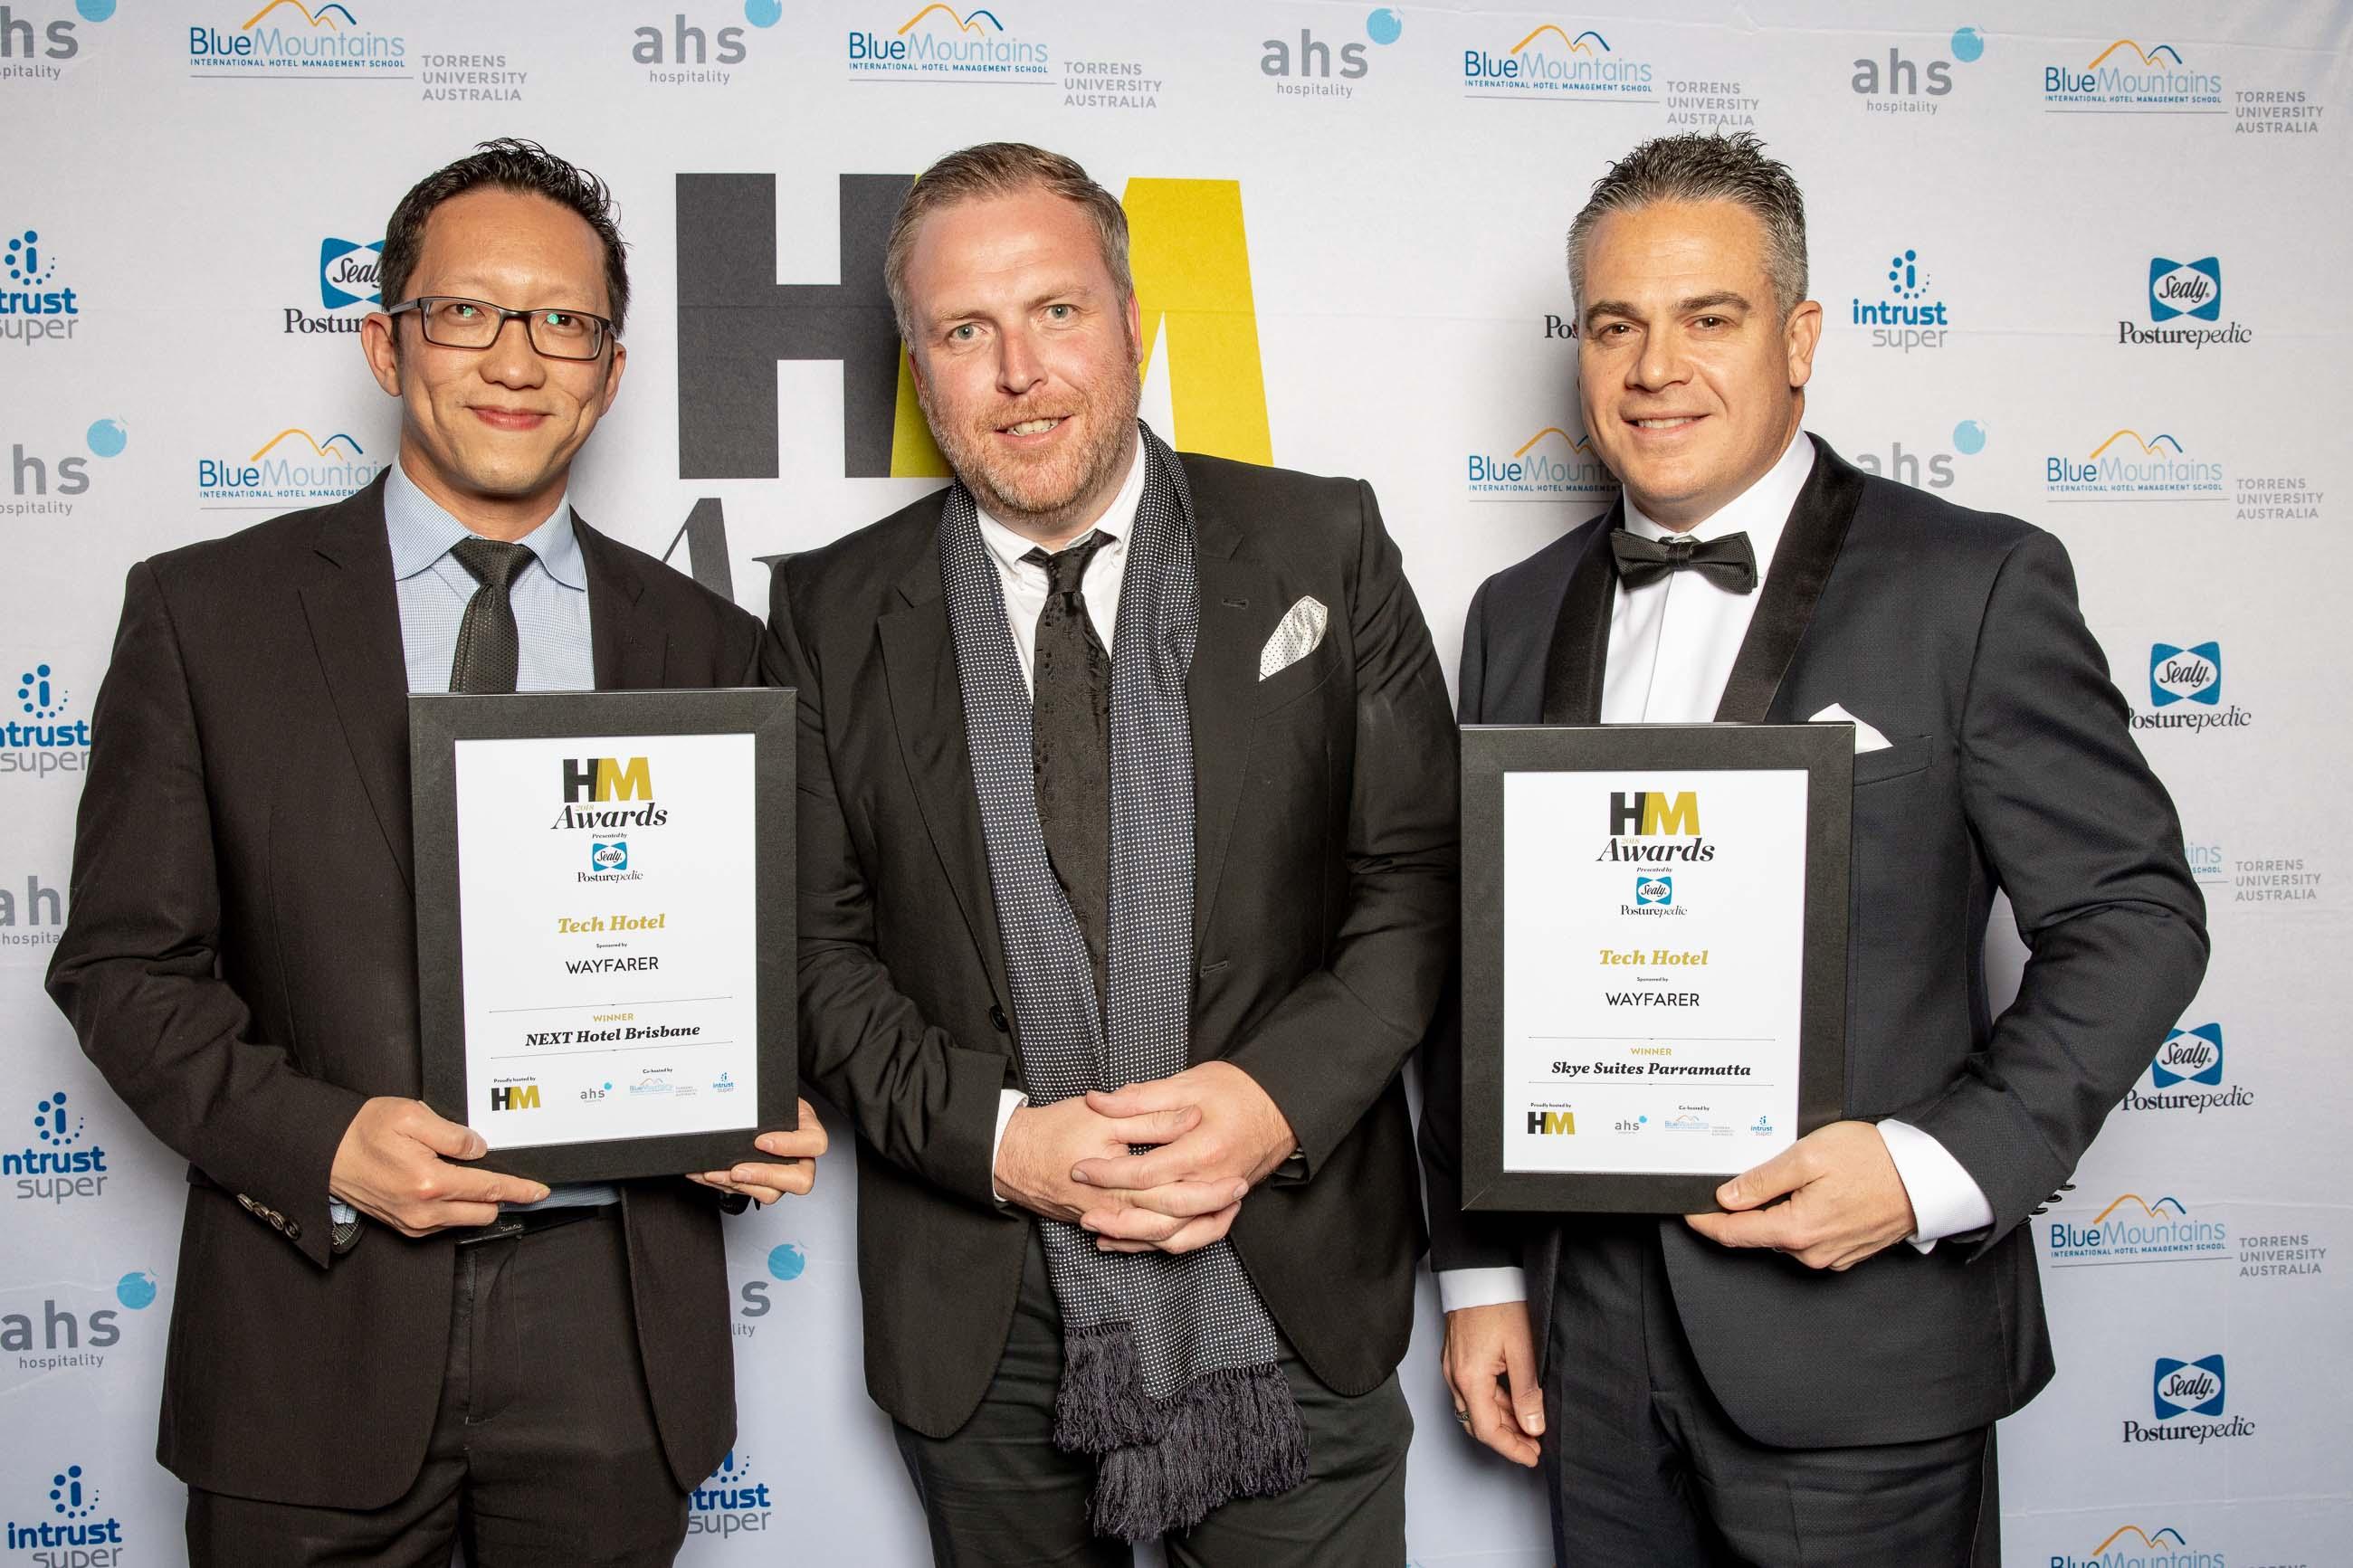 72ppi-HMawards-2018-official-award-wall-111111